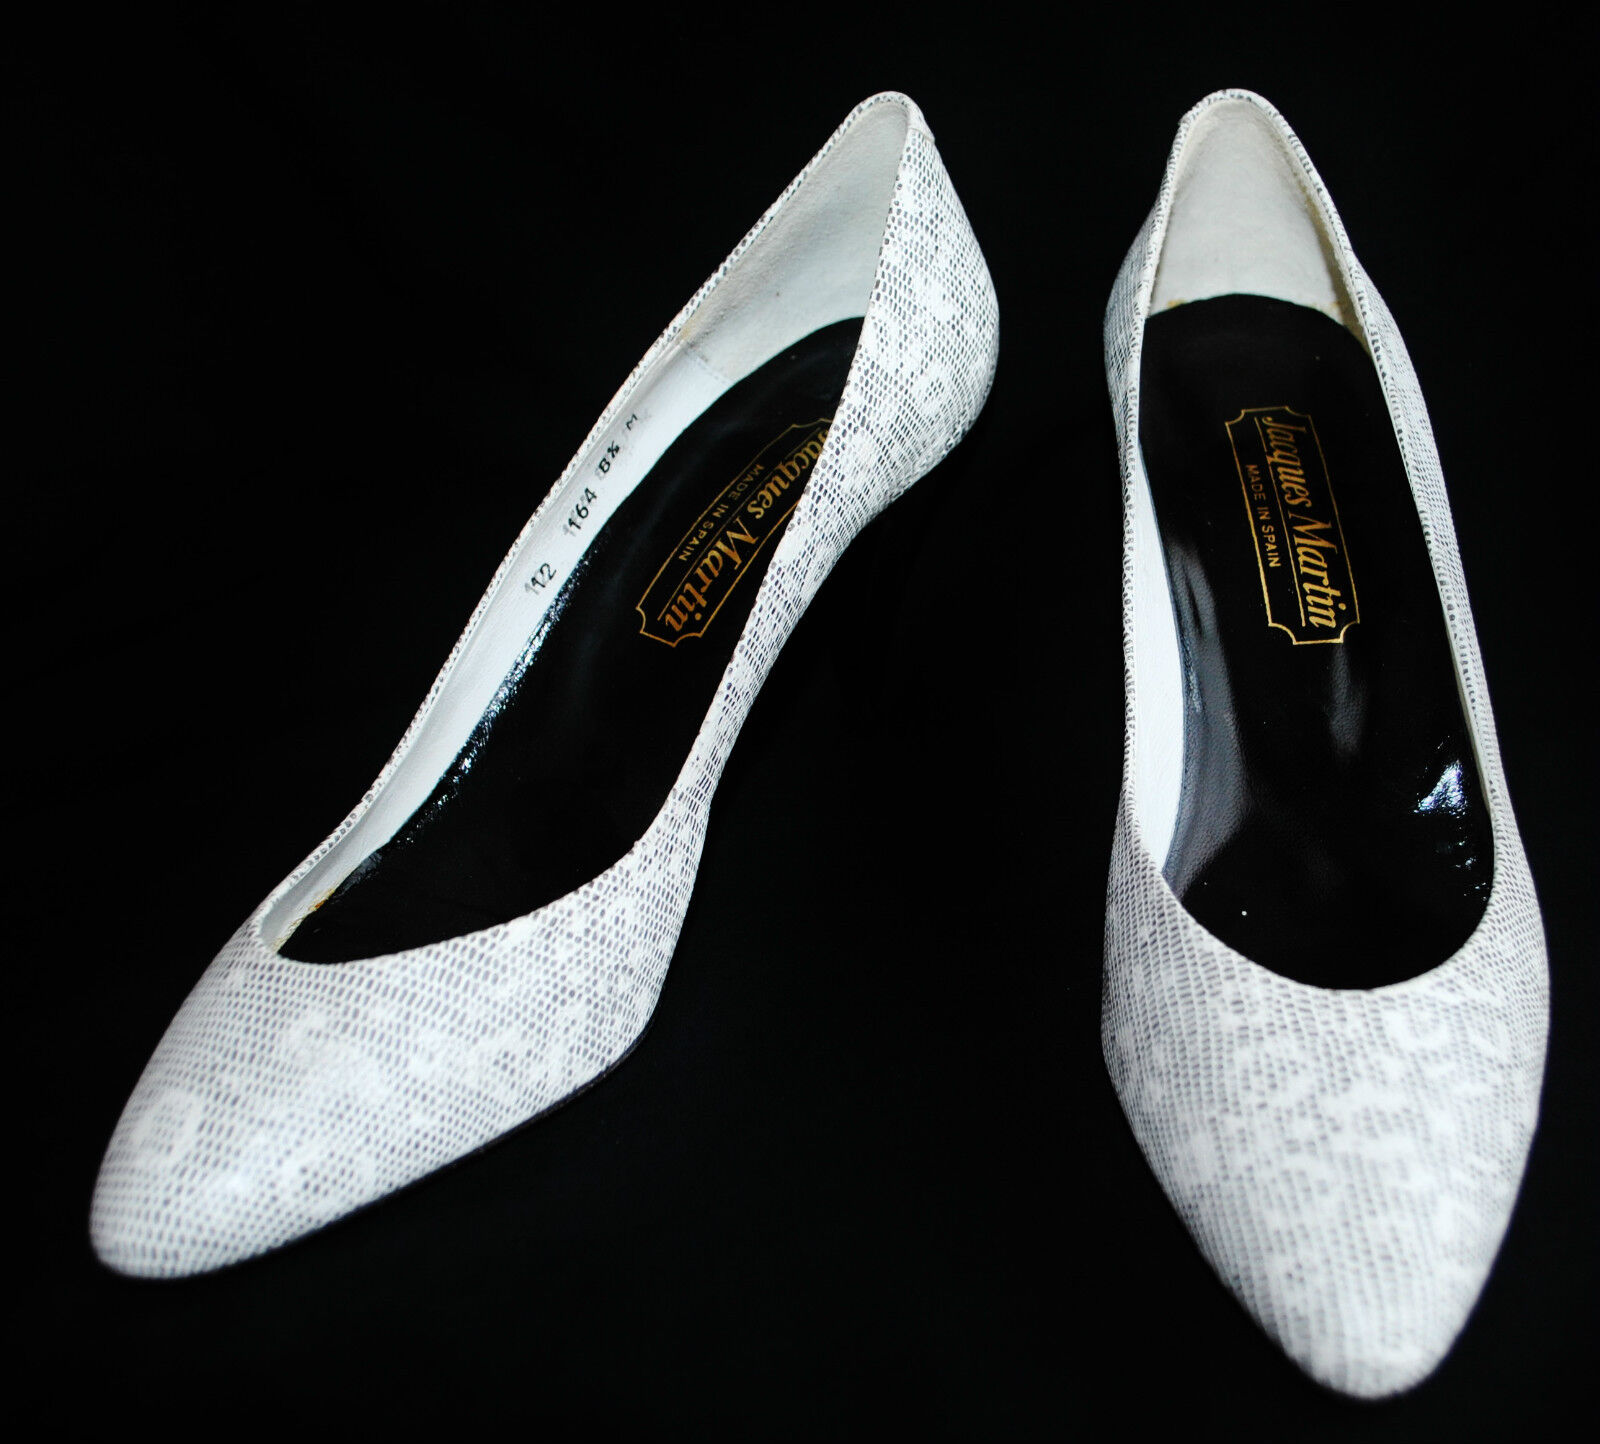 Designer Jacques Martin Spain Leather Snake Print Classic Pump Heel Pump Classic Shoe 8.5 6cef2f